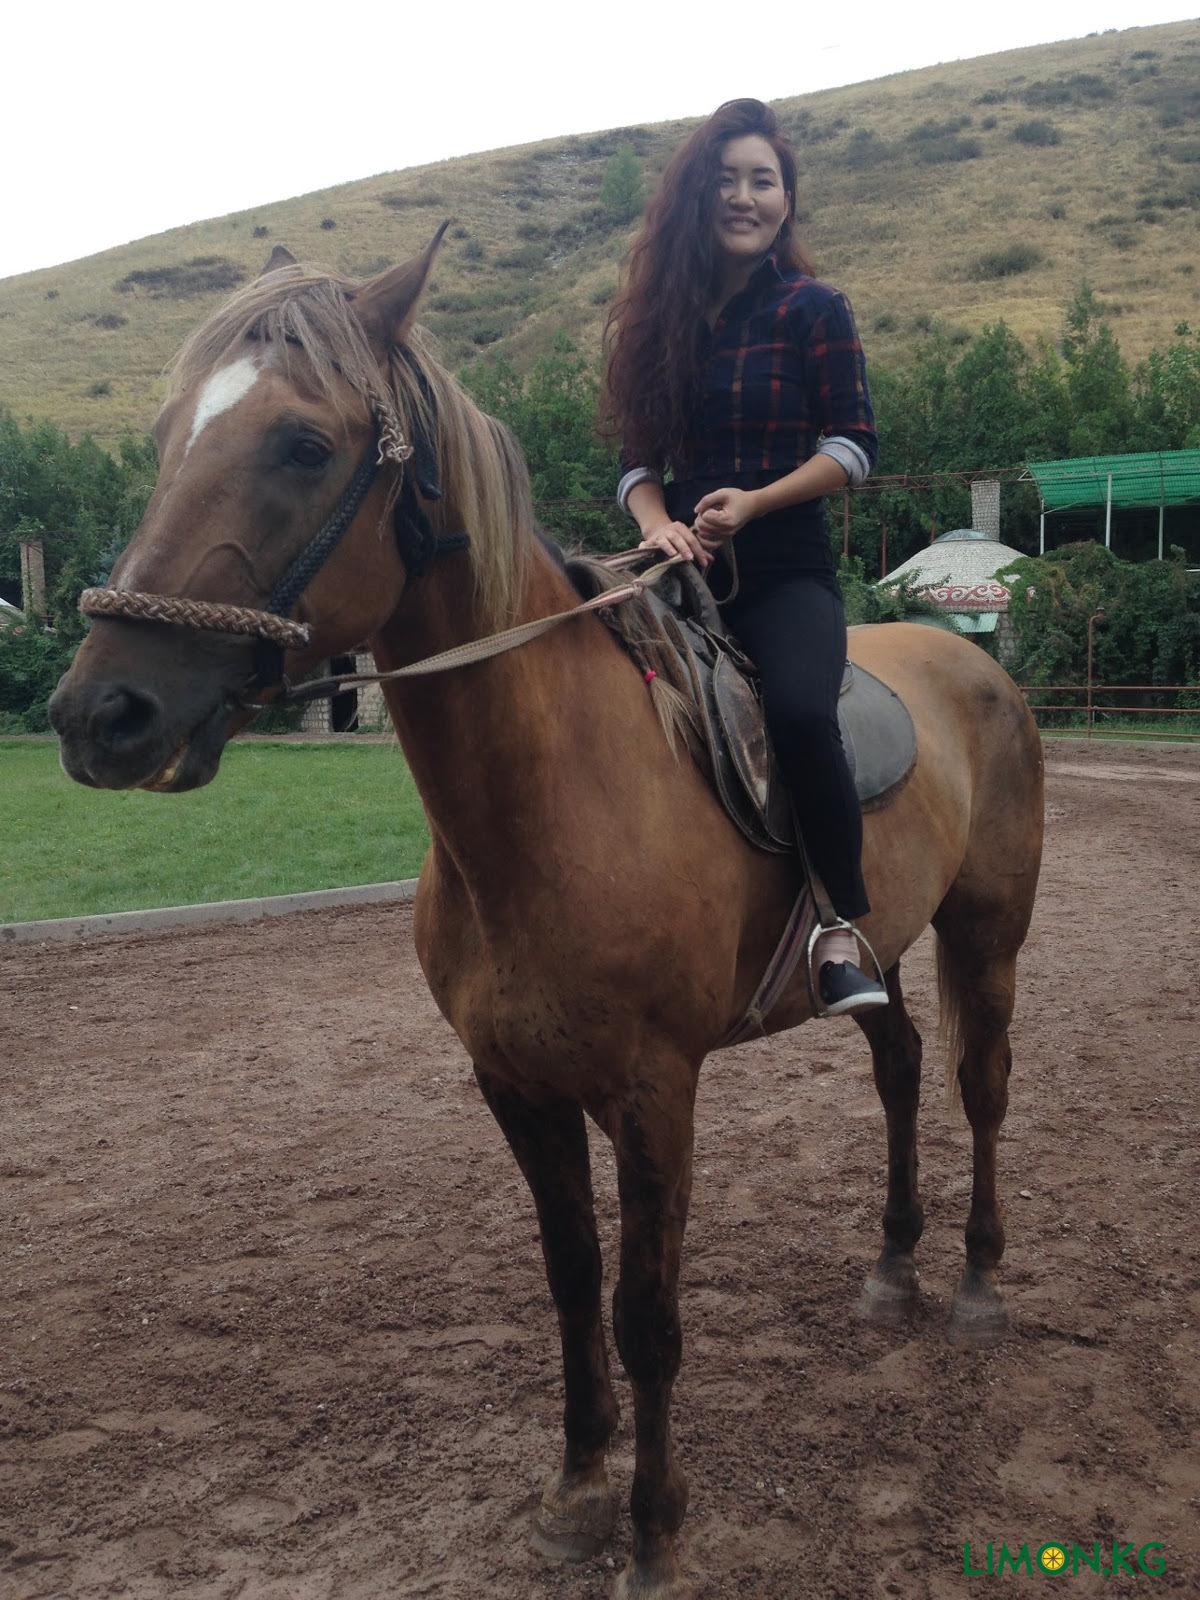 My hobby ride a horse